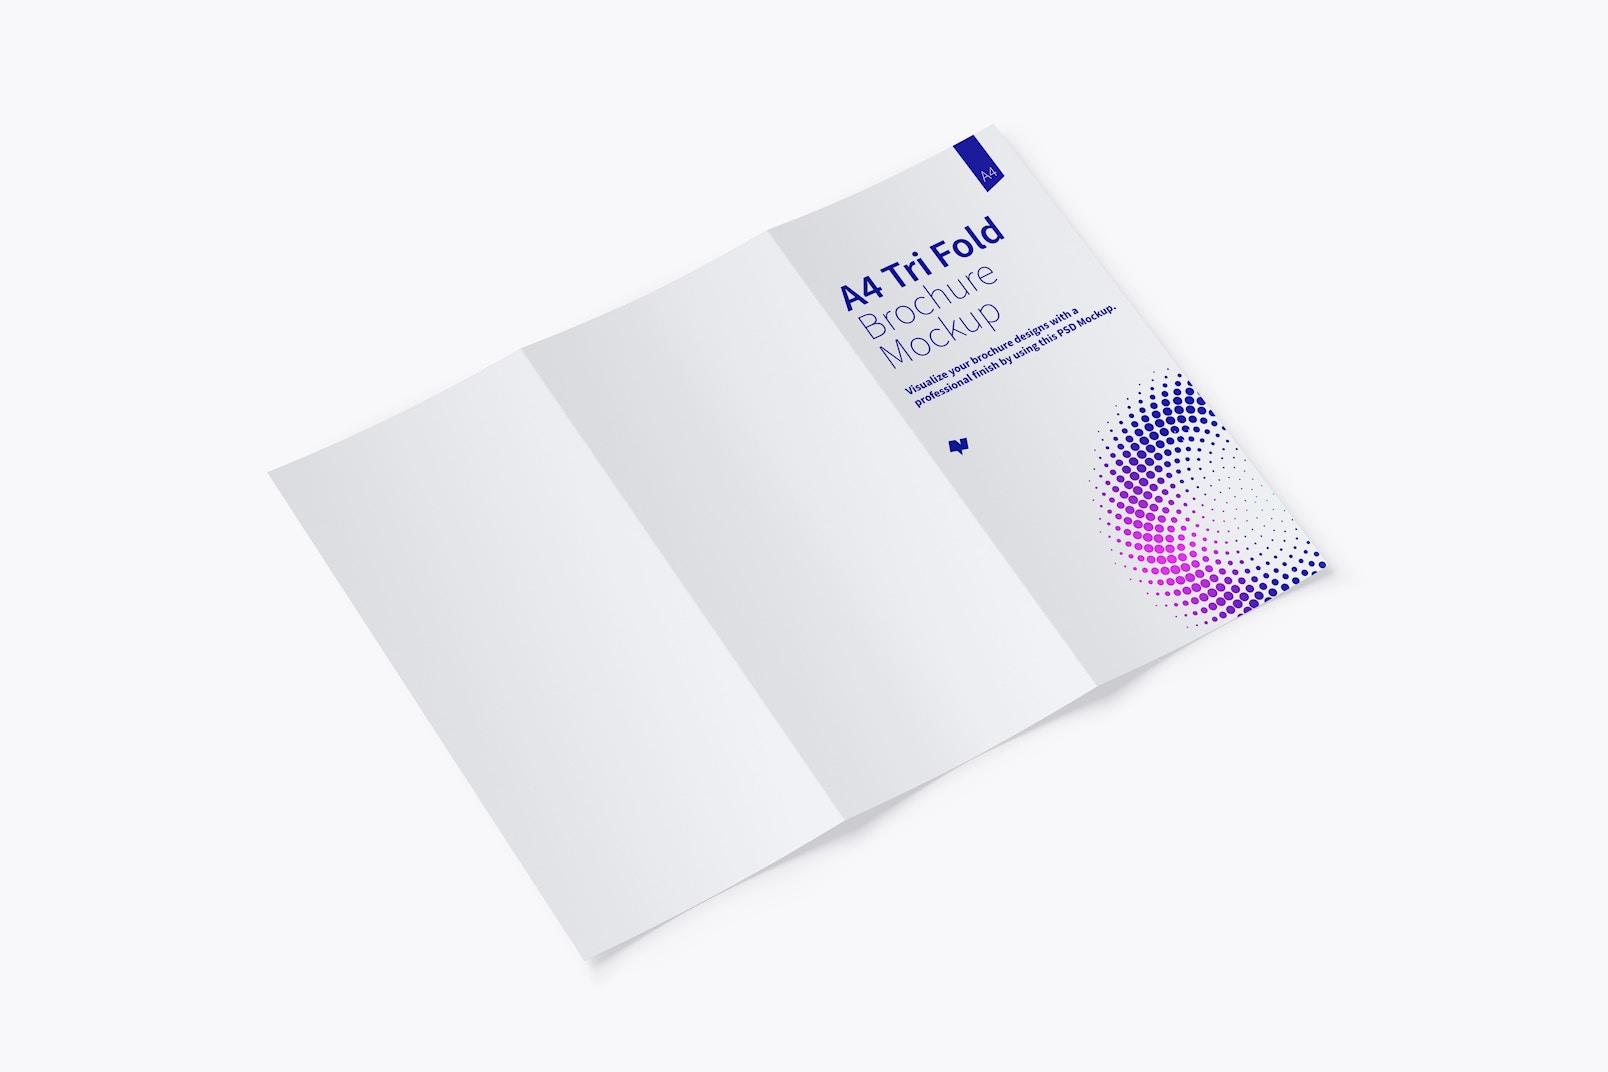 A4 Trifold Brochure Mockup 02